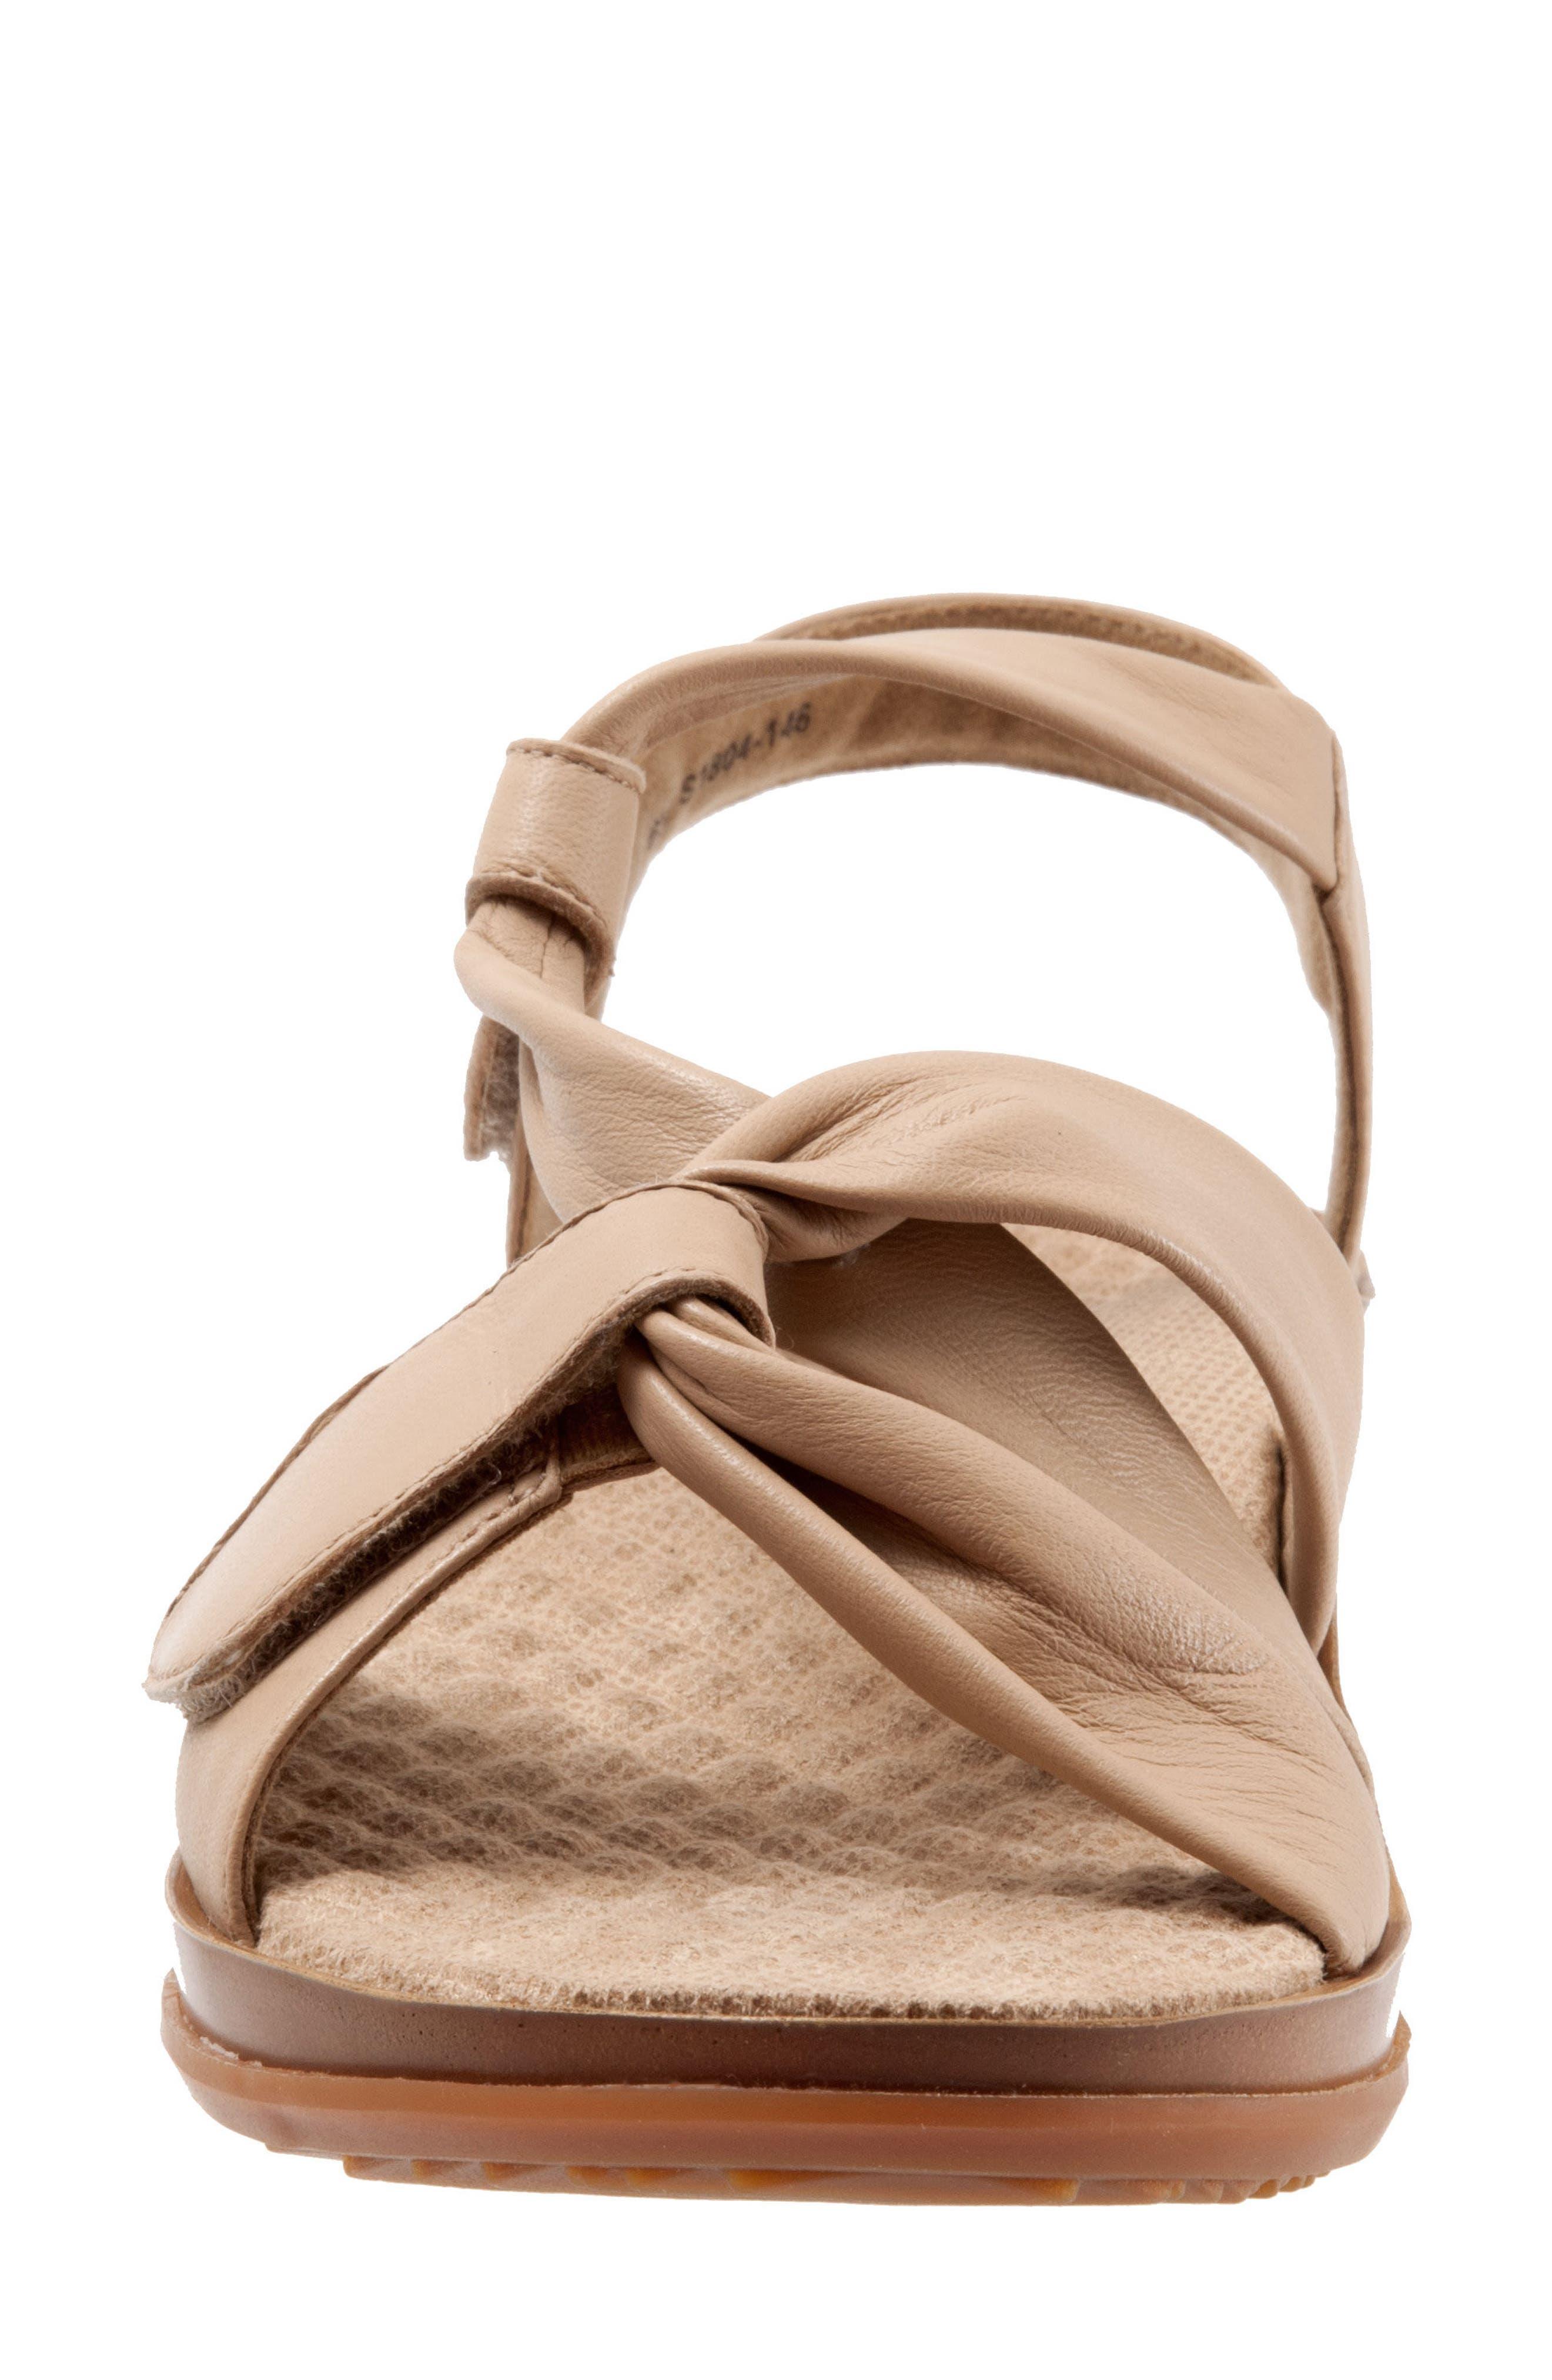 Del Rey Sandal,                             Alternate thumbnail 4, color,                             Nude Leather